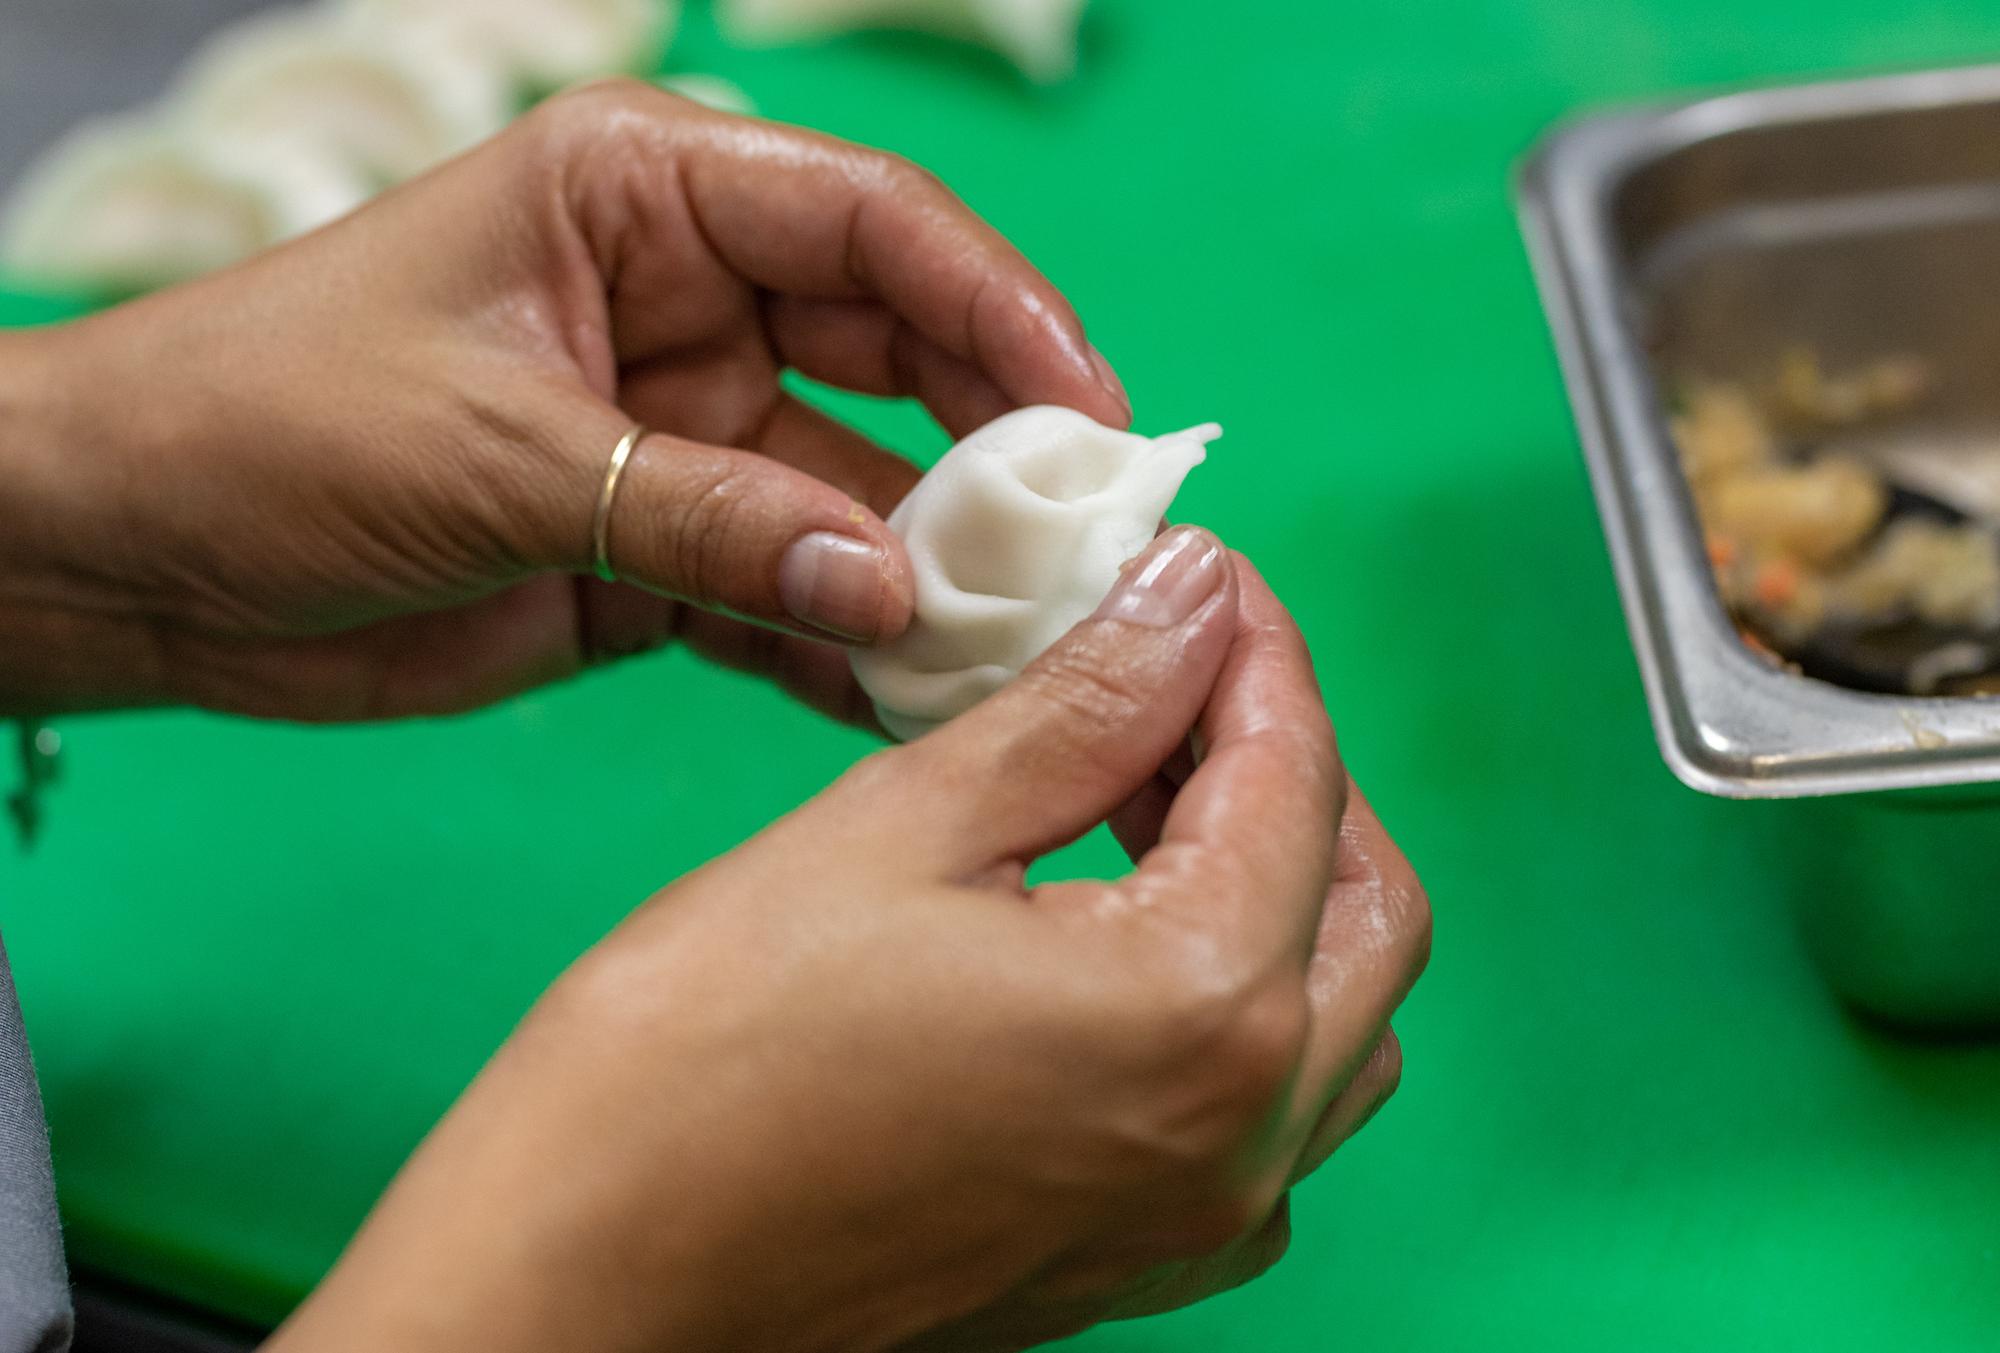 Hands wrap a dumpling over a bright green cutting board.